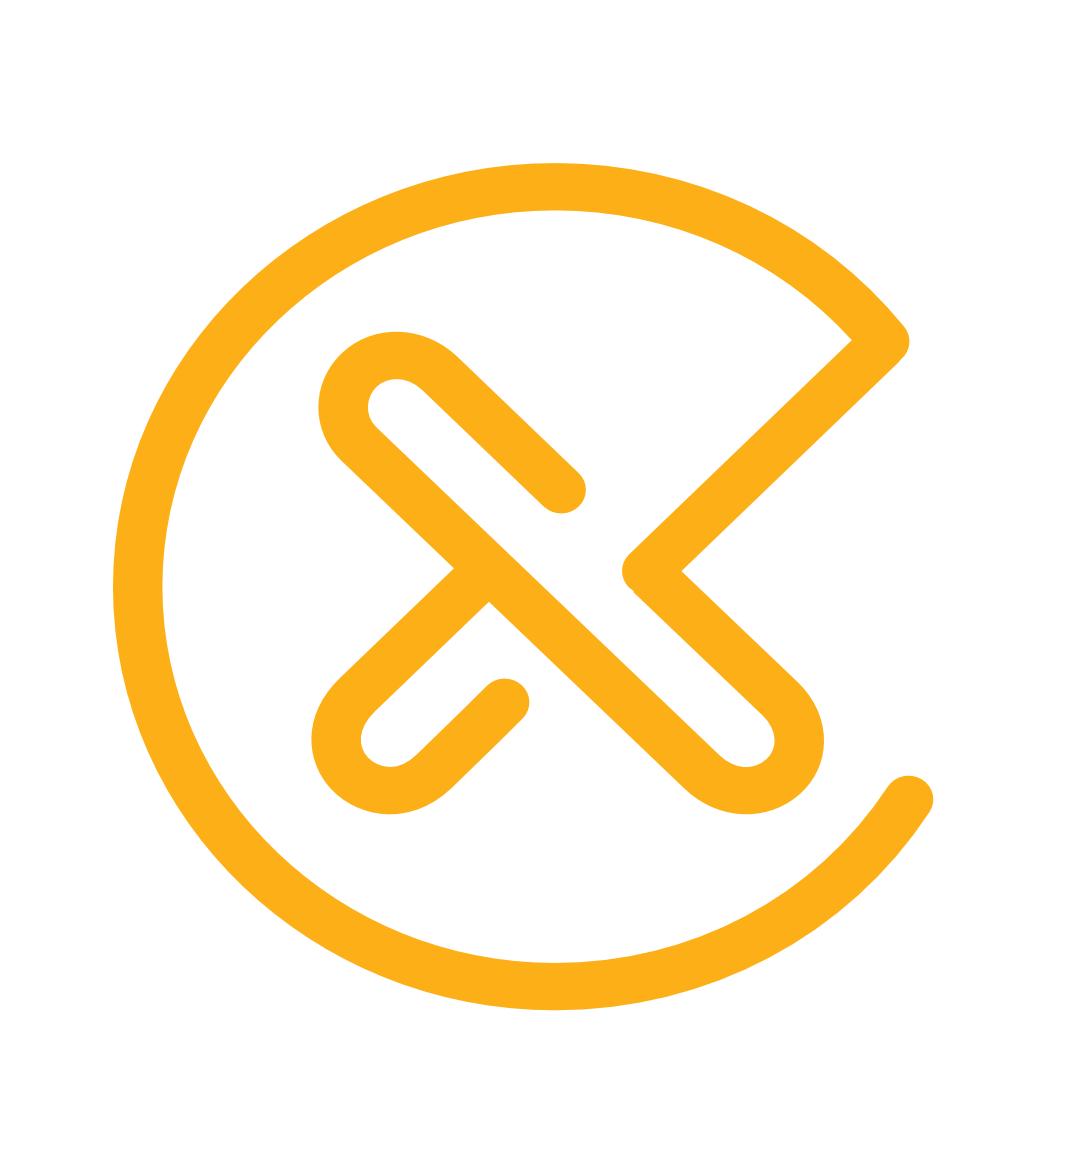 XC_Logo_Signet-smaller